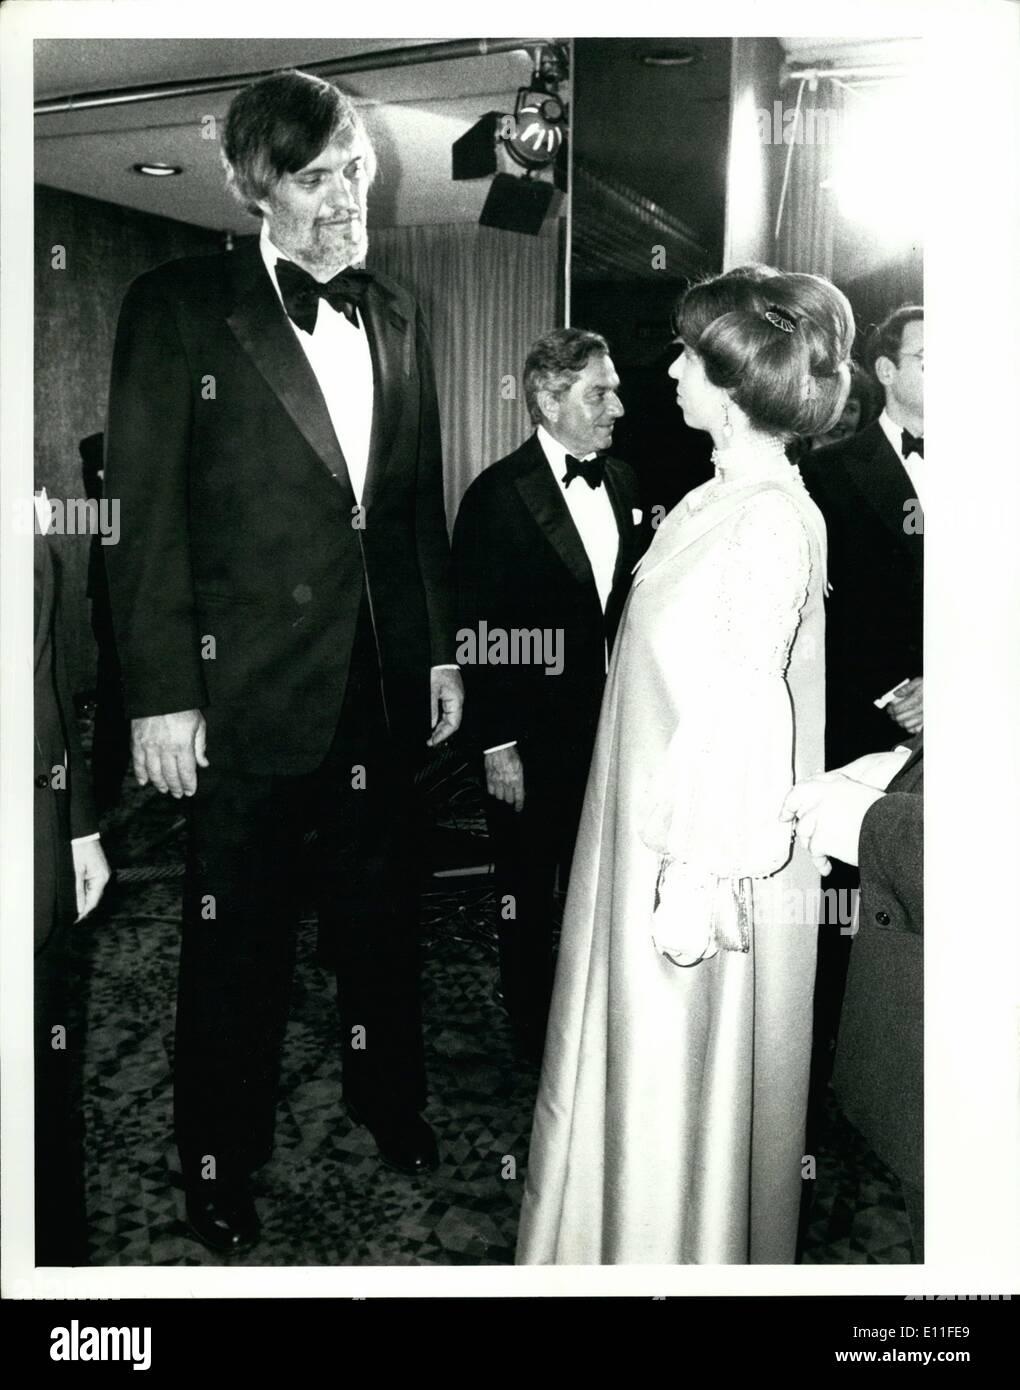 Jul. 07, 1977 - Pr., Anne & actor Richard Kiel review of ''The Spy Who Loved Me'' Bond film, Odeon, London. - Stock Image